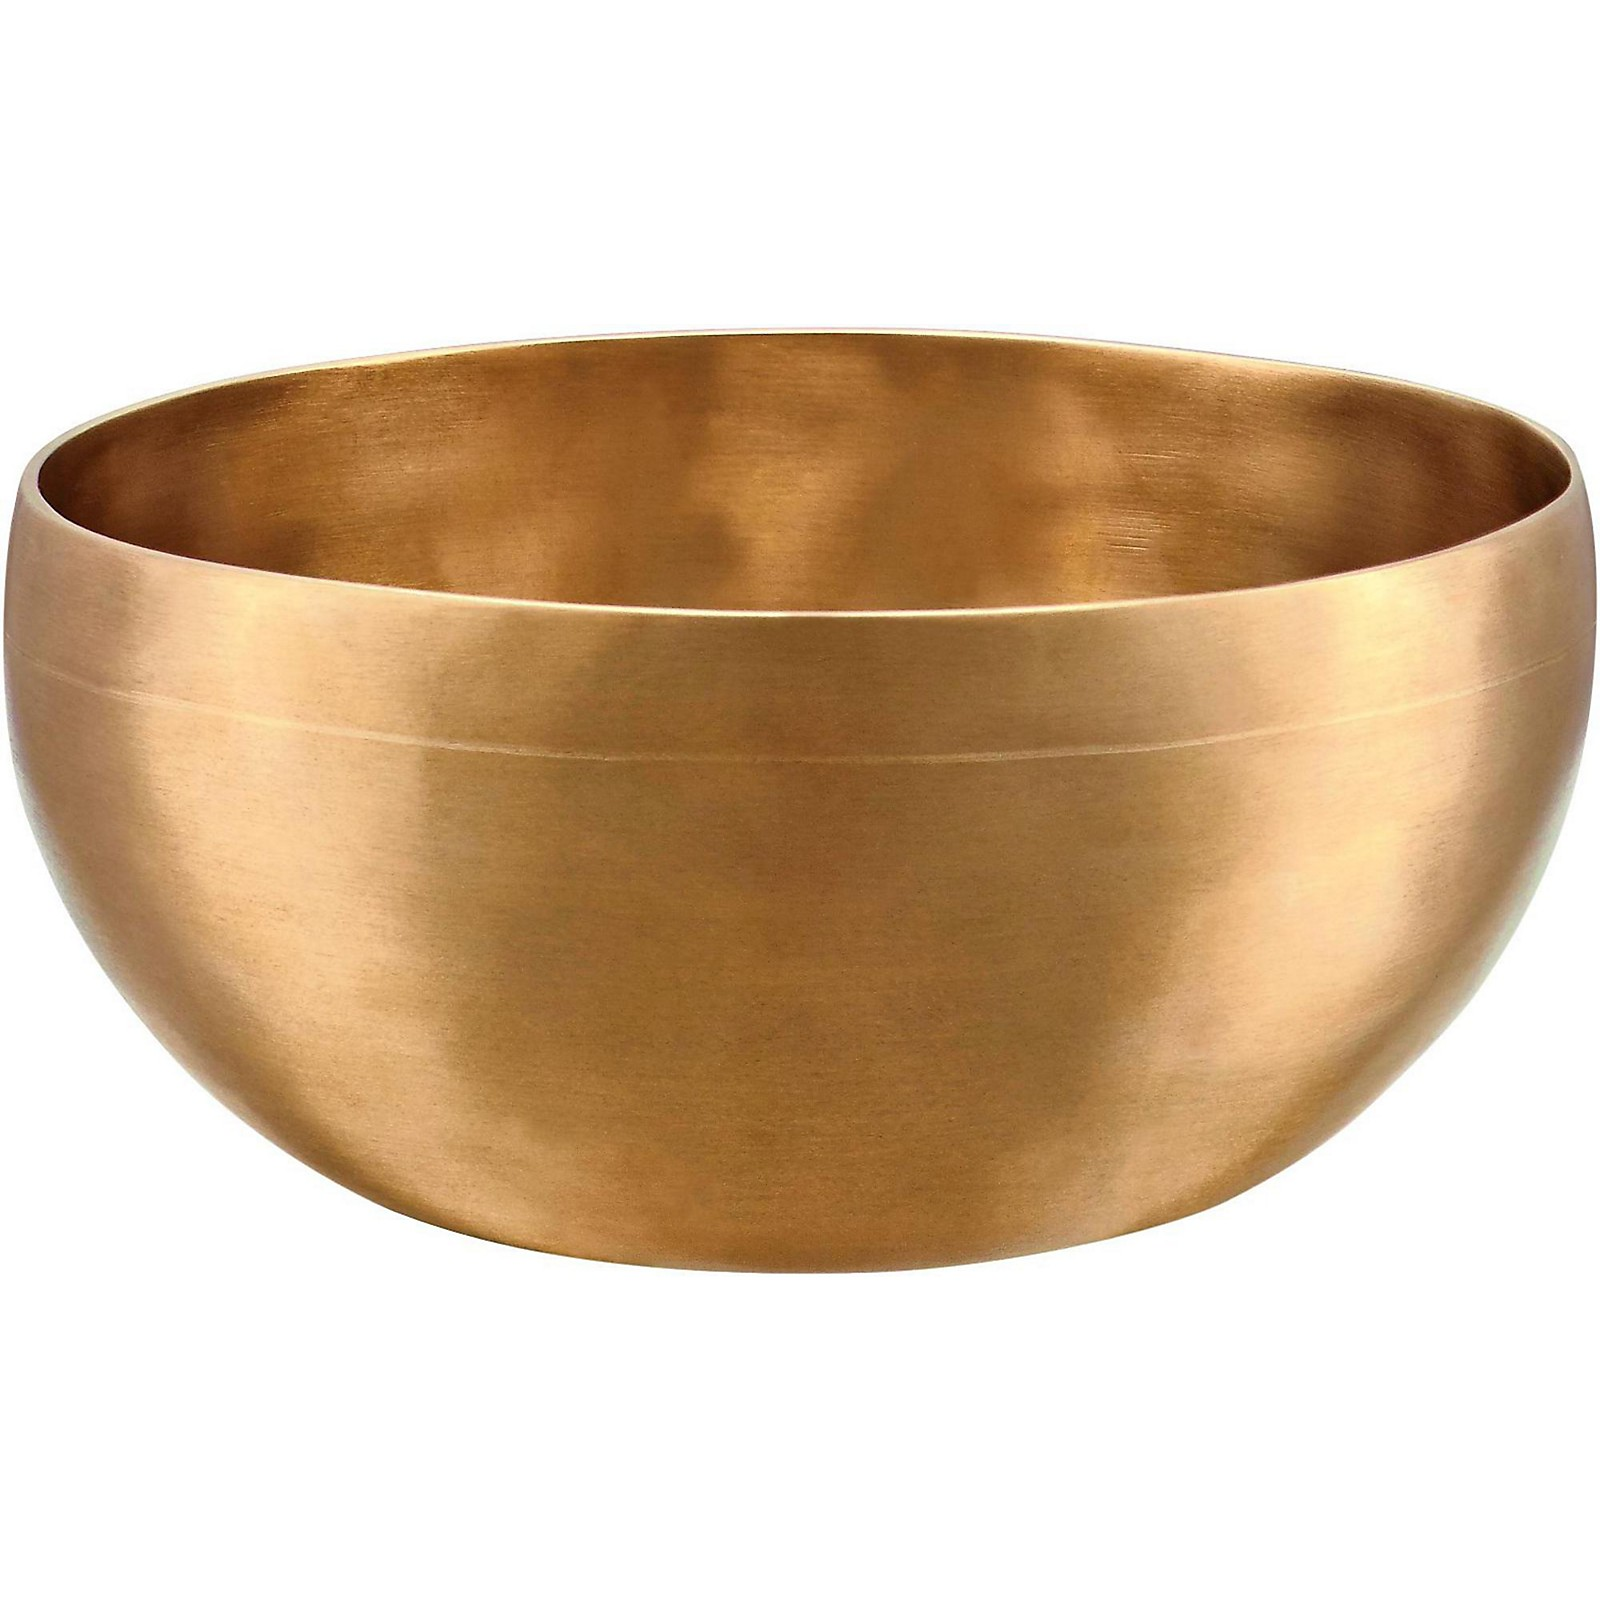 Meinl Sonic Energy Universal Singing Bowl